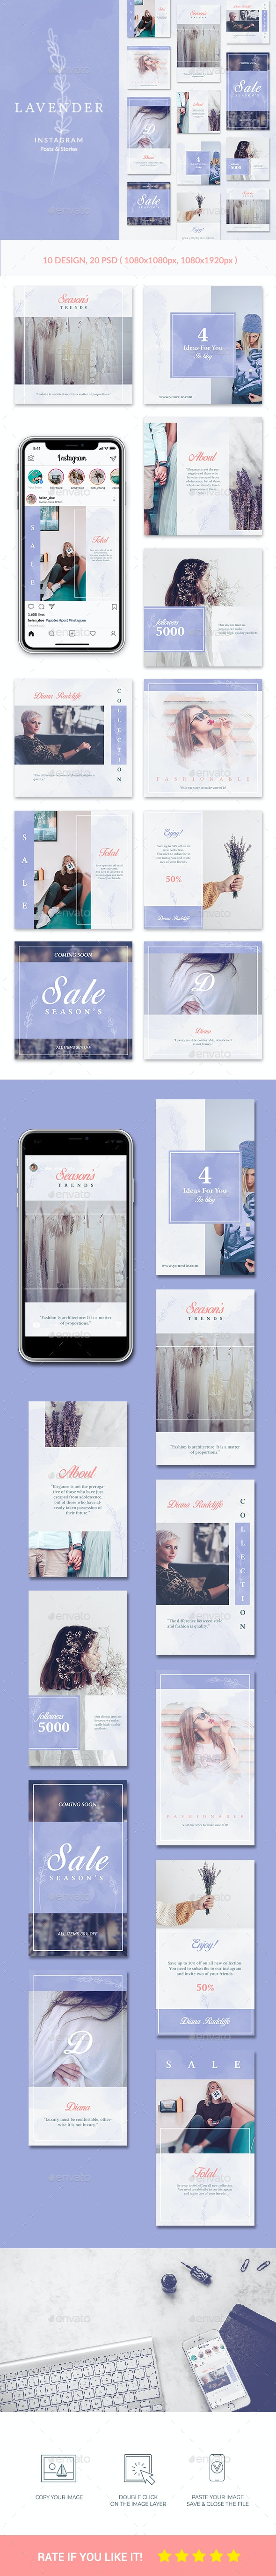 Instagram Posts & Stories - Lavender - Social Media Web Elements